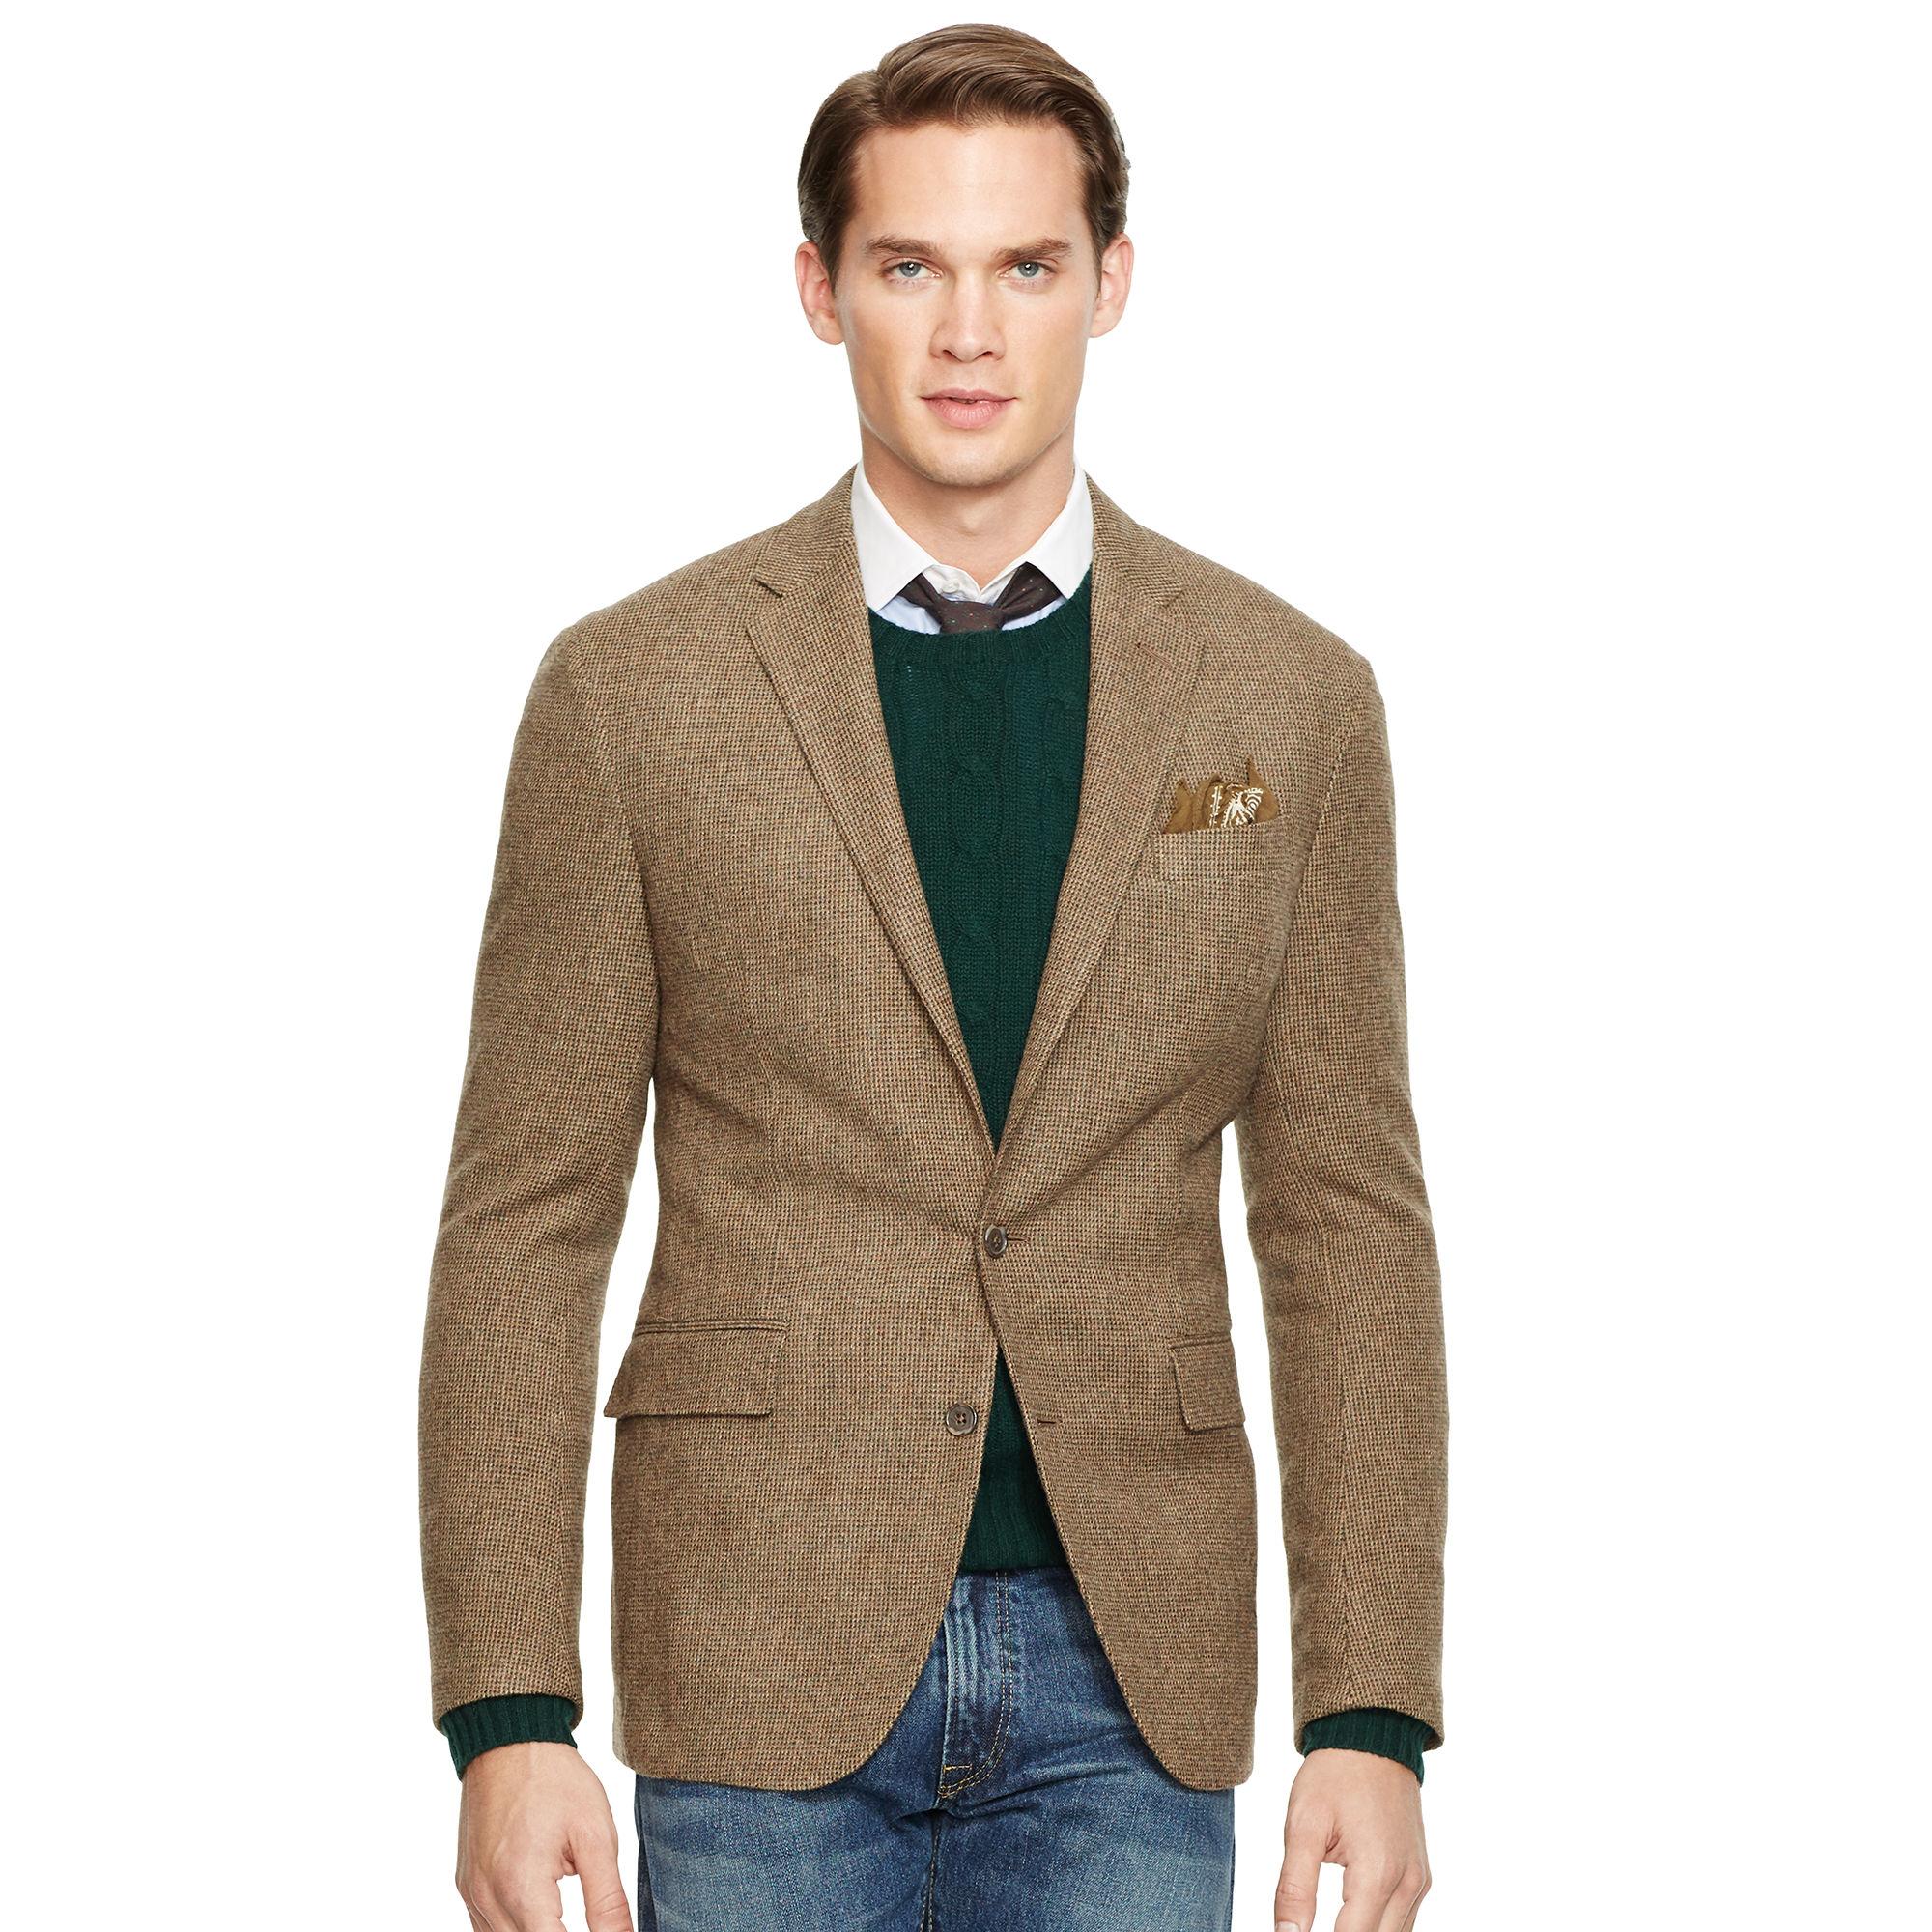 polo ralph lauren tick weave sport coat in green for men. Black Bedroom Furniture Sets. Home Design Ideas